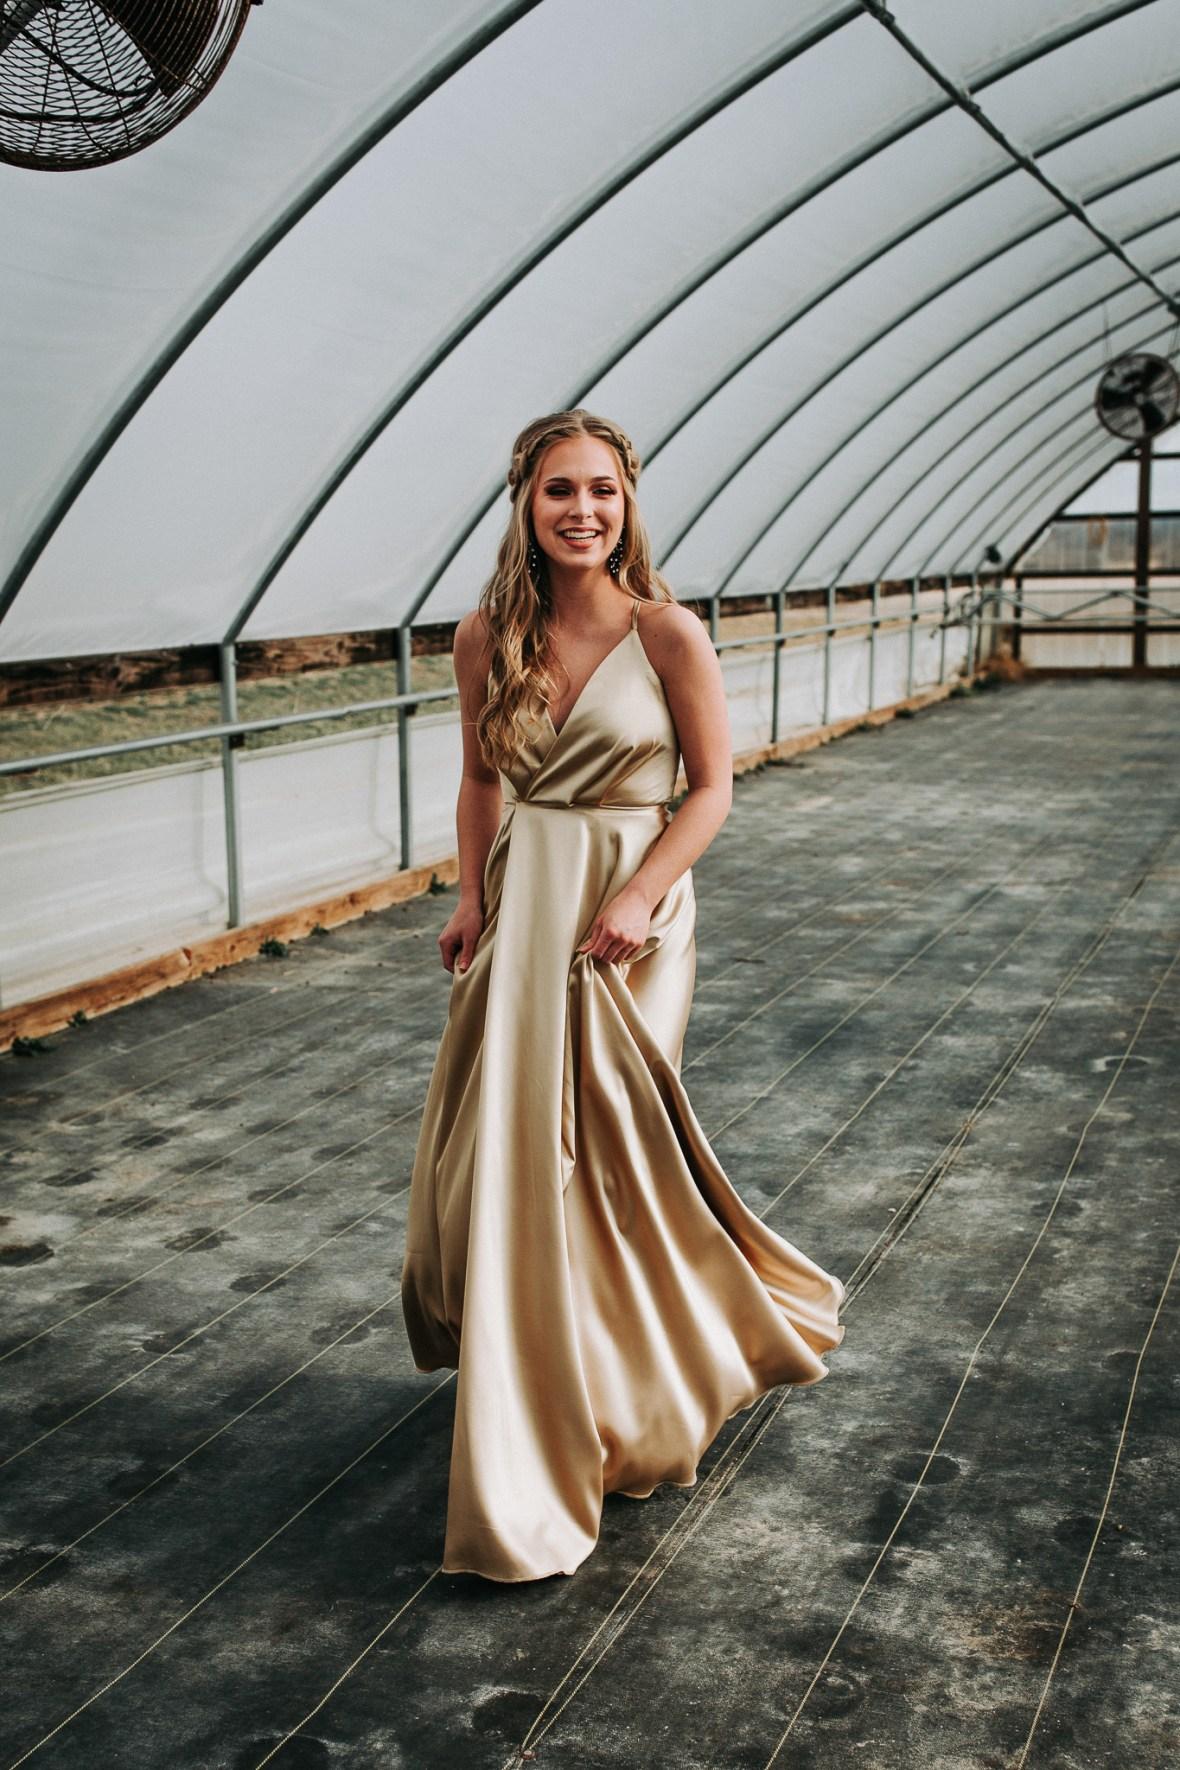 Kimberly Phillips Clothier Brandenburg Kentucky